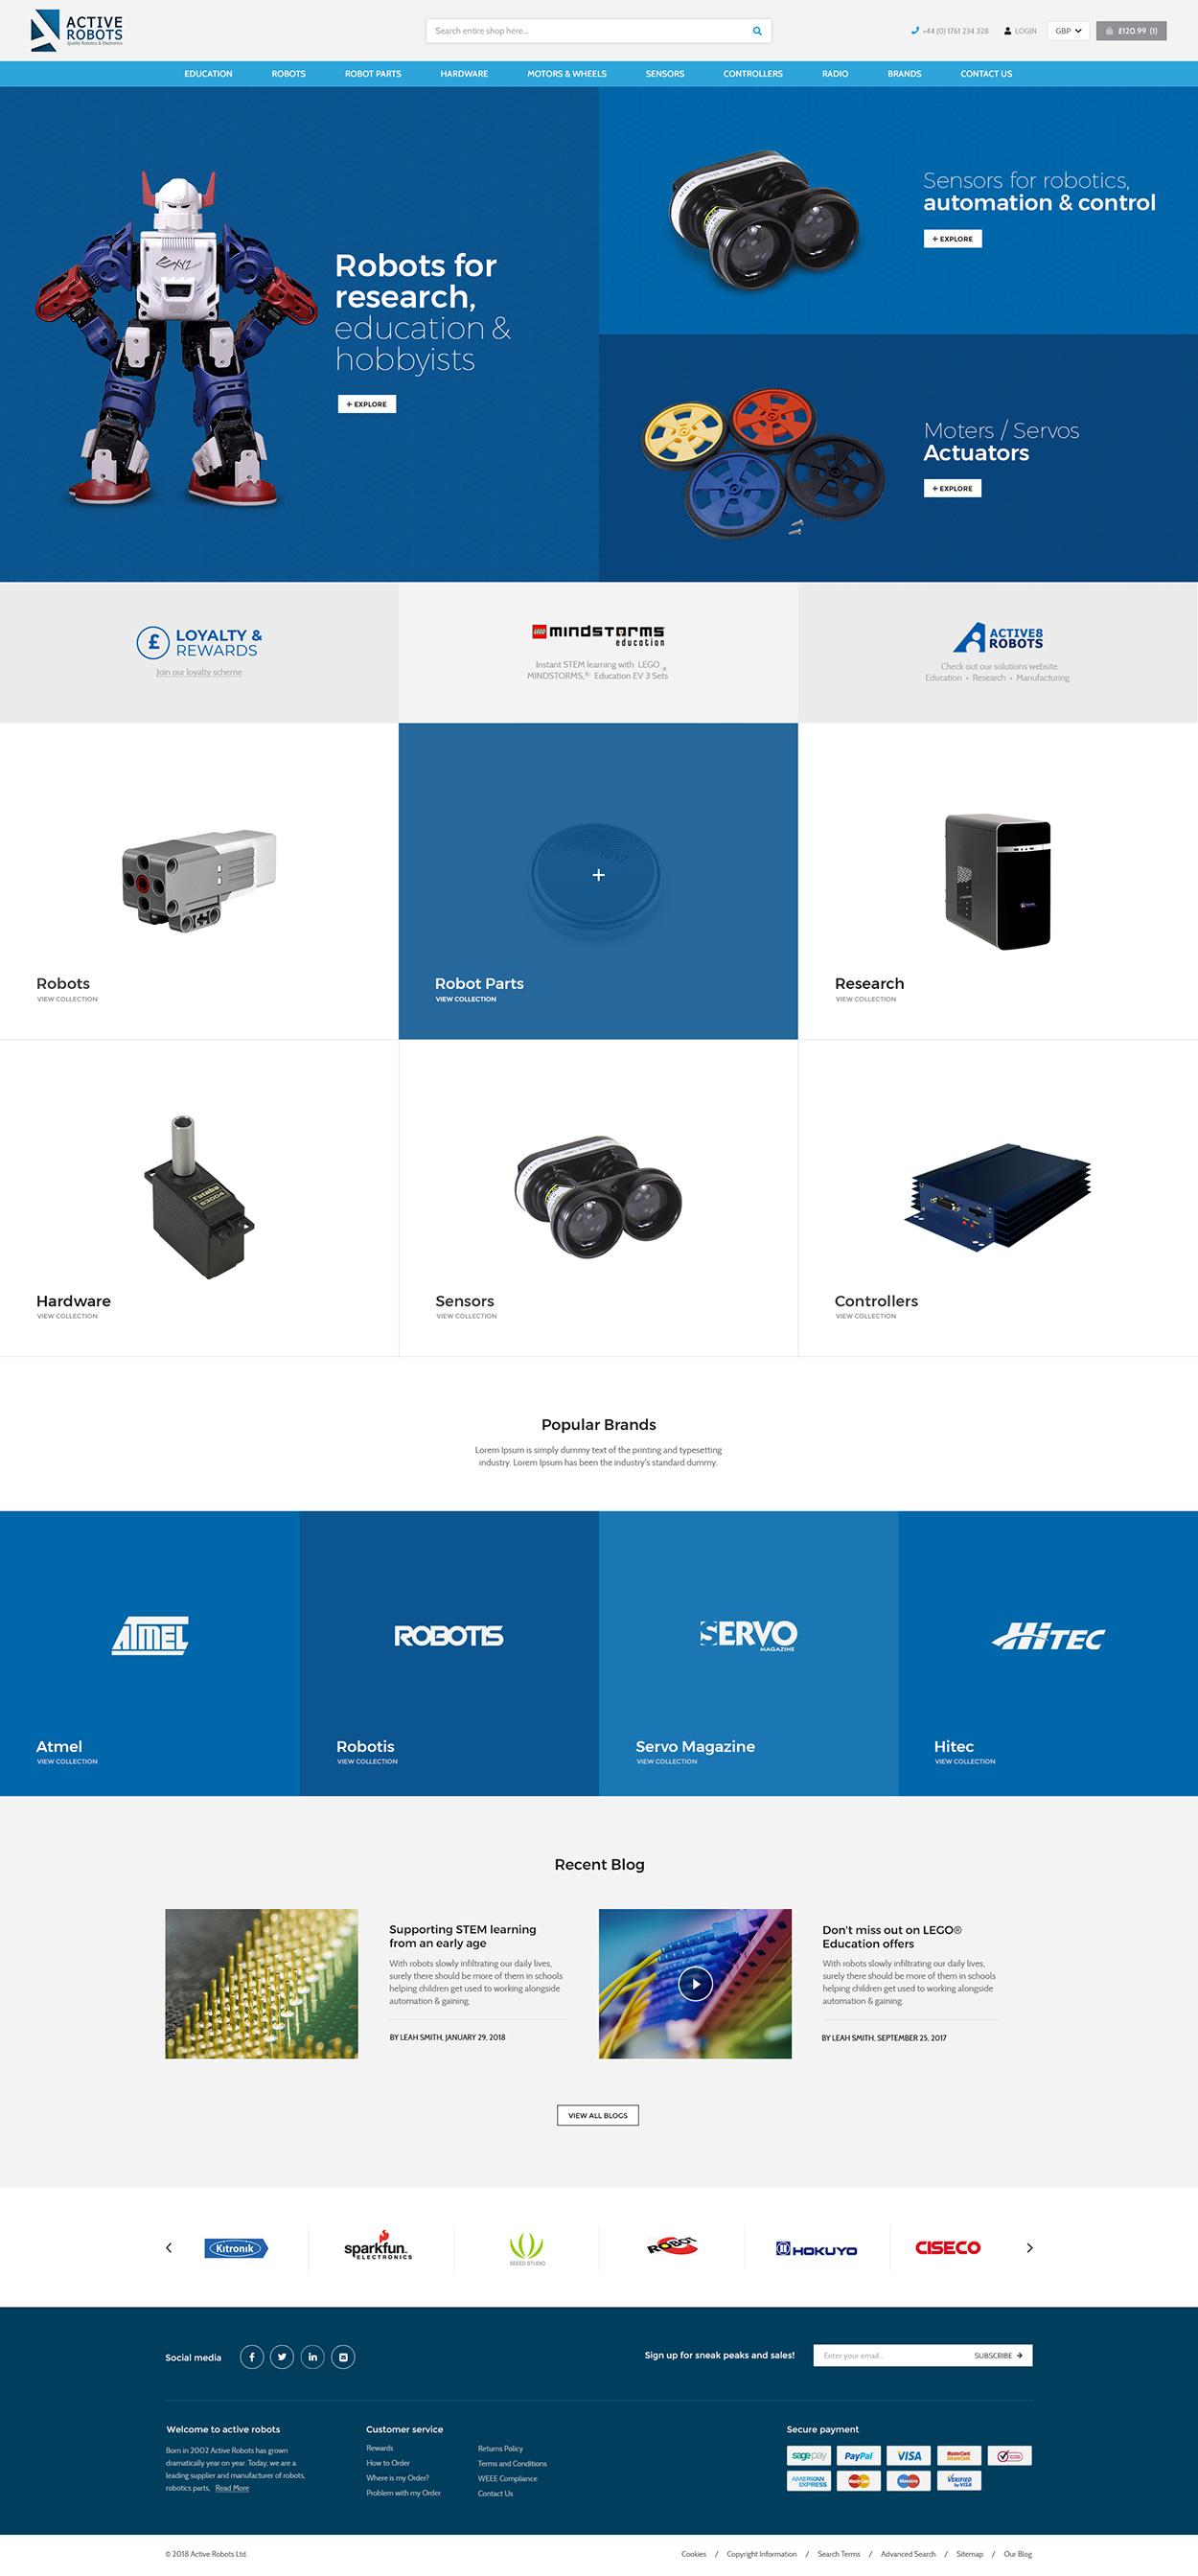 portfolio-detail-active-robots-img-02-scaled